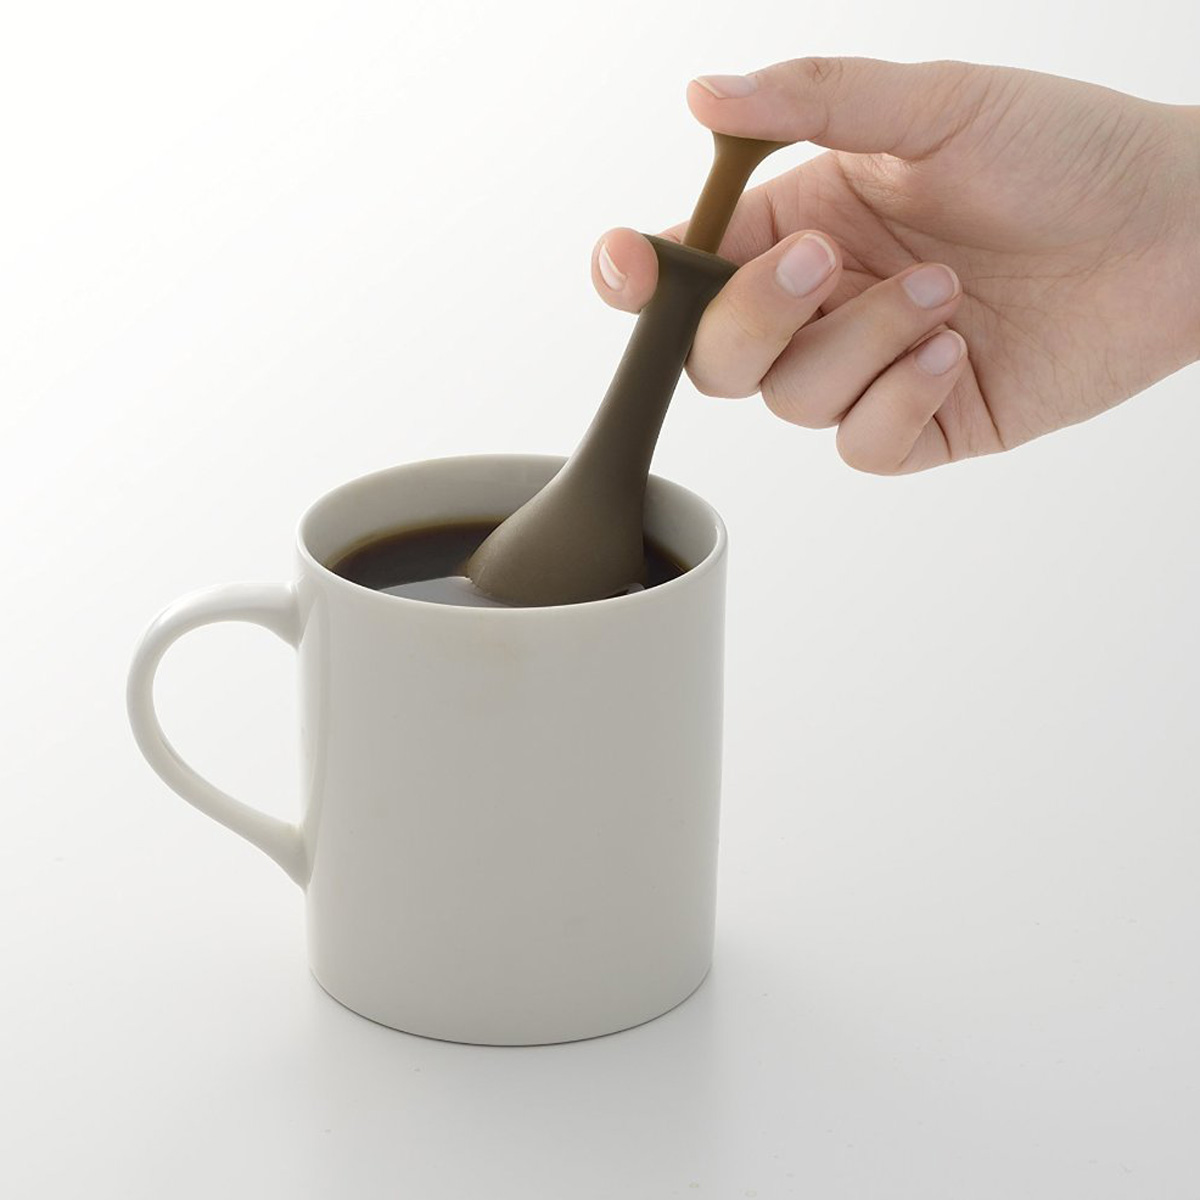 aozora mini coffee press worlds most portable coffee maker 6 Minicoffee Maker